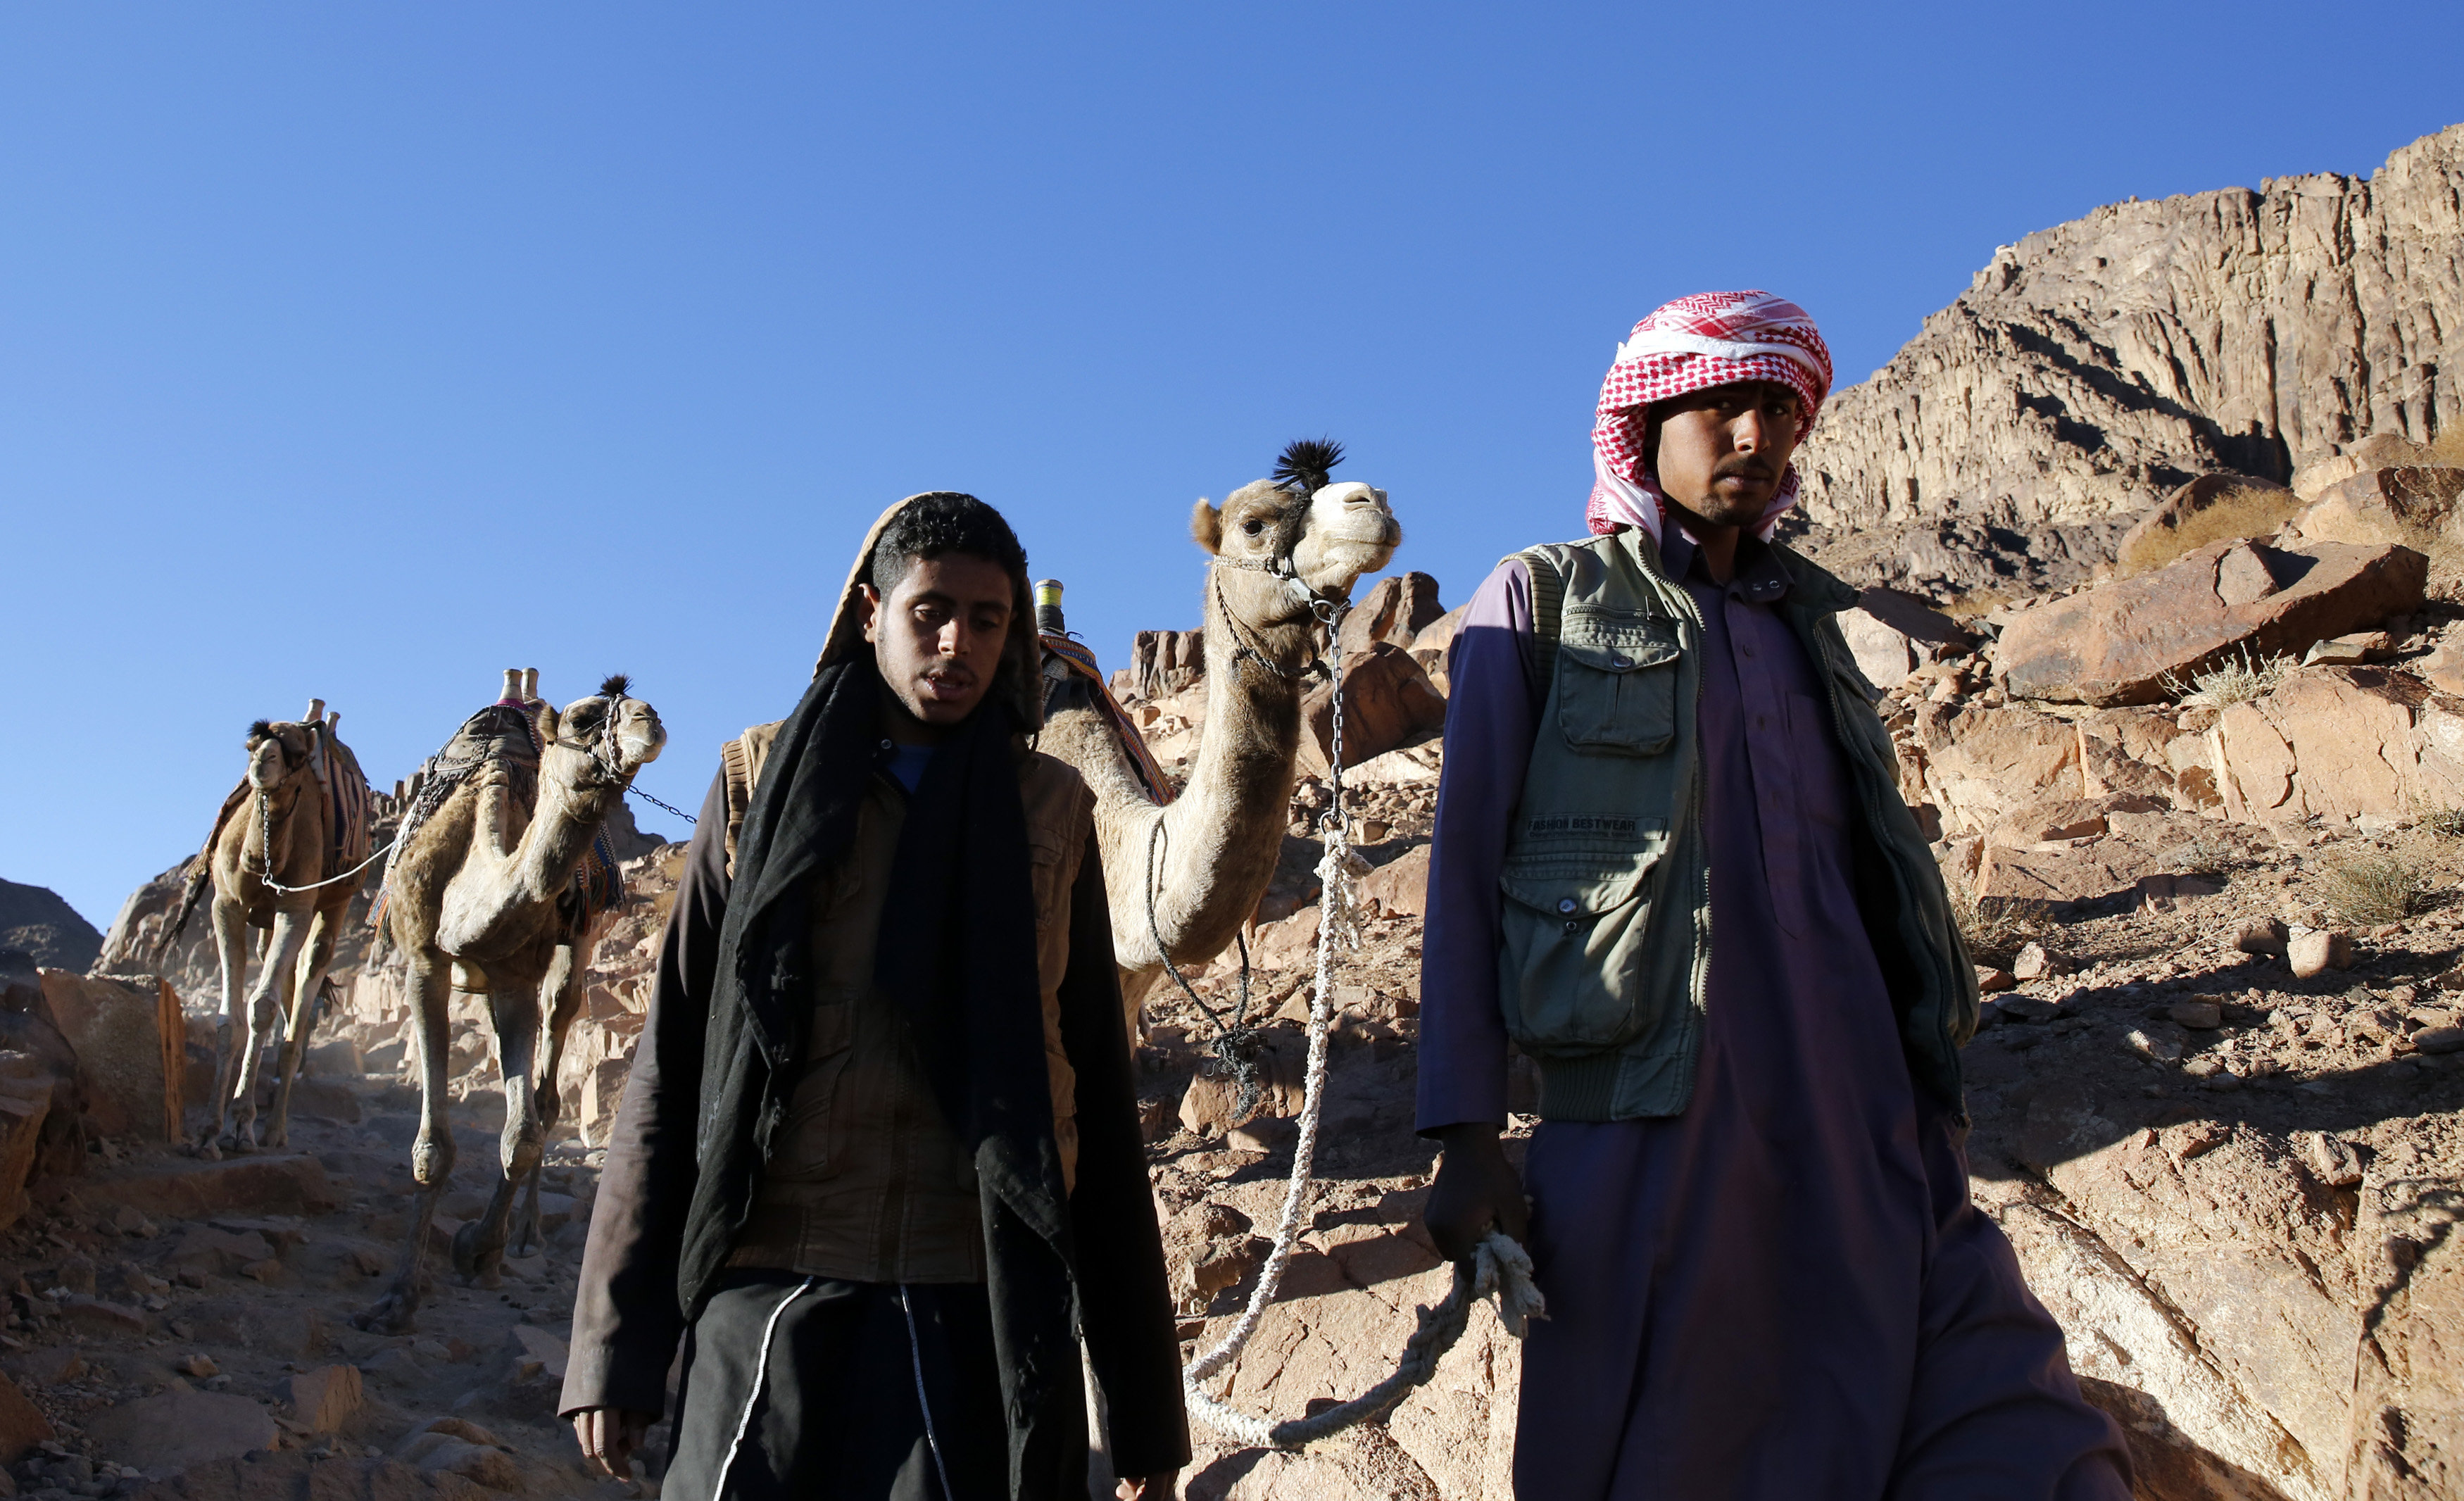 EGYPT TOURISM REUTERSAmrAbdallahDalsh vedouinoi odigoi